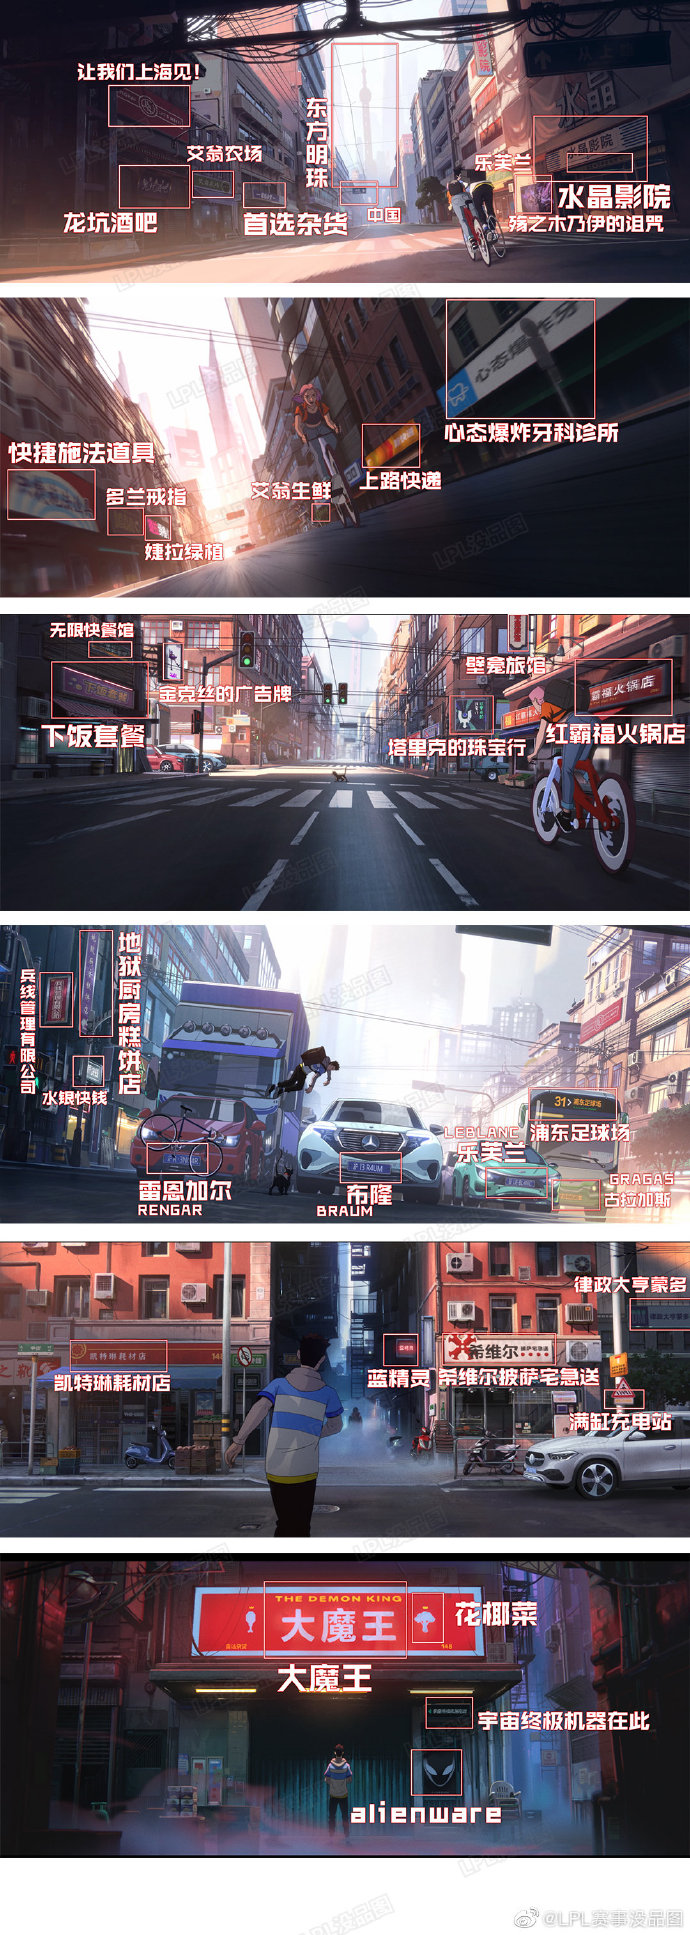 S10主题曲MV有哪些隐藏的彩蛋?JDG时空回溯,李哥玩手机